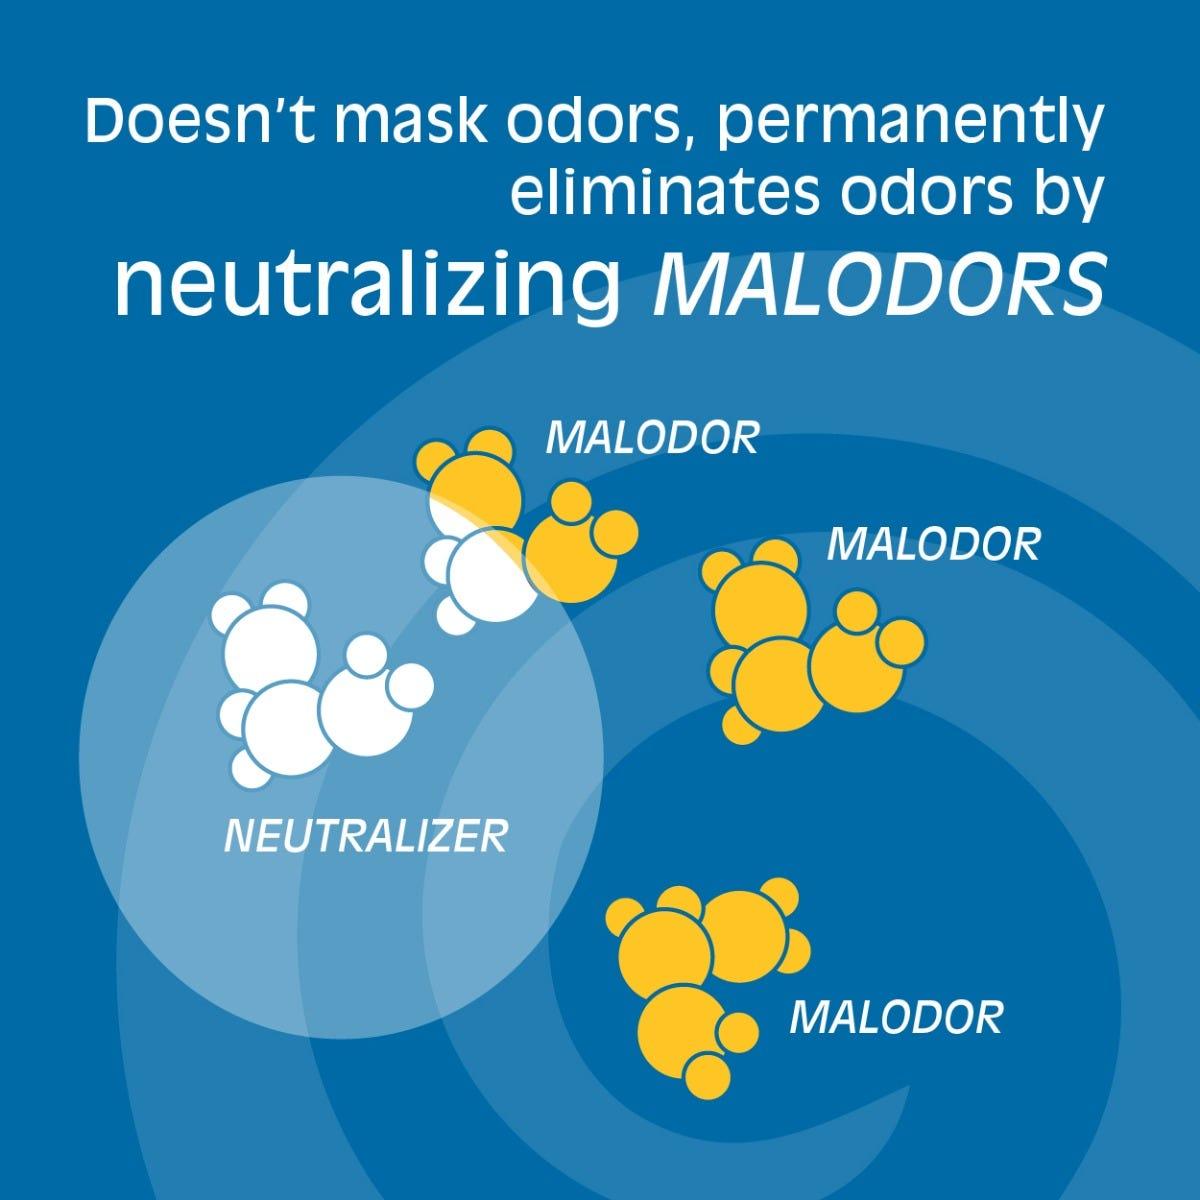 https://googone.com/media/catalog/product/t/r/tropical_odor_absorber_malorders.jpg